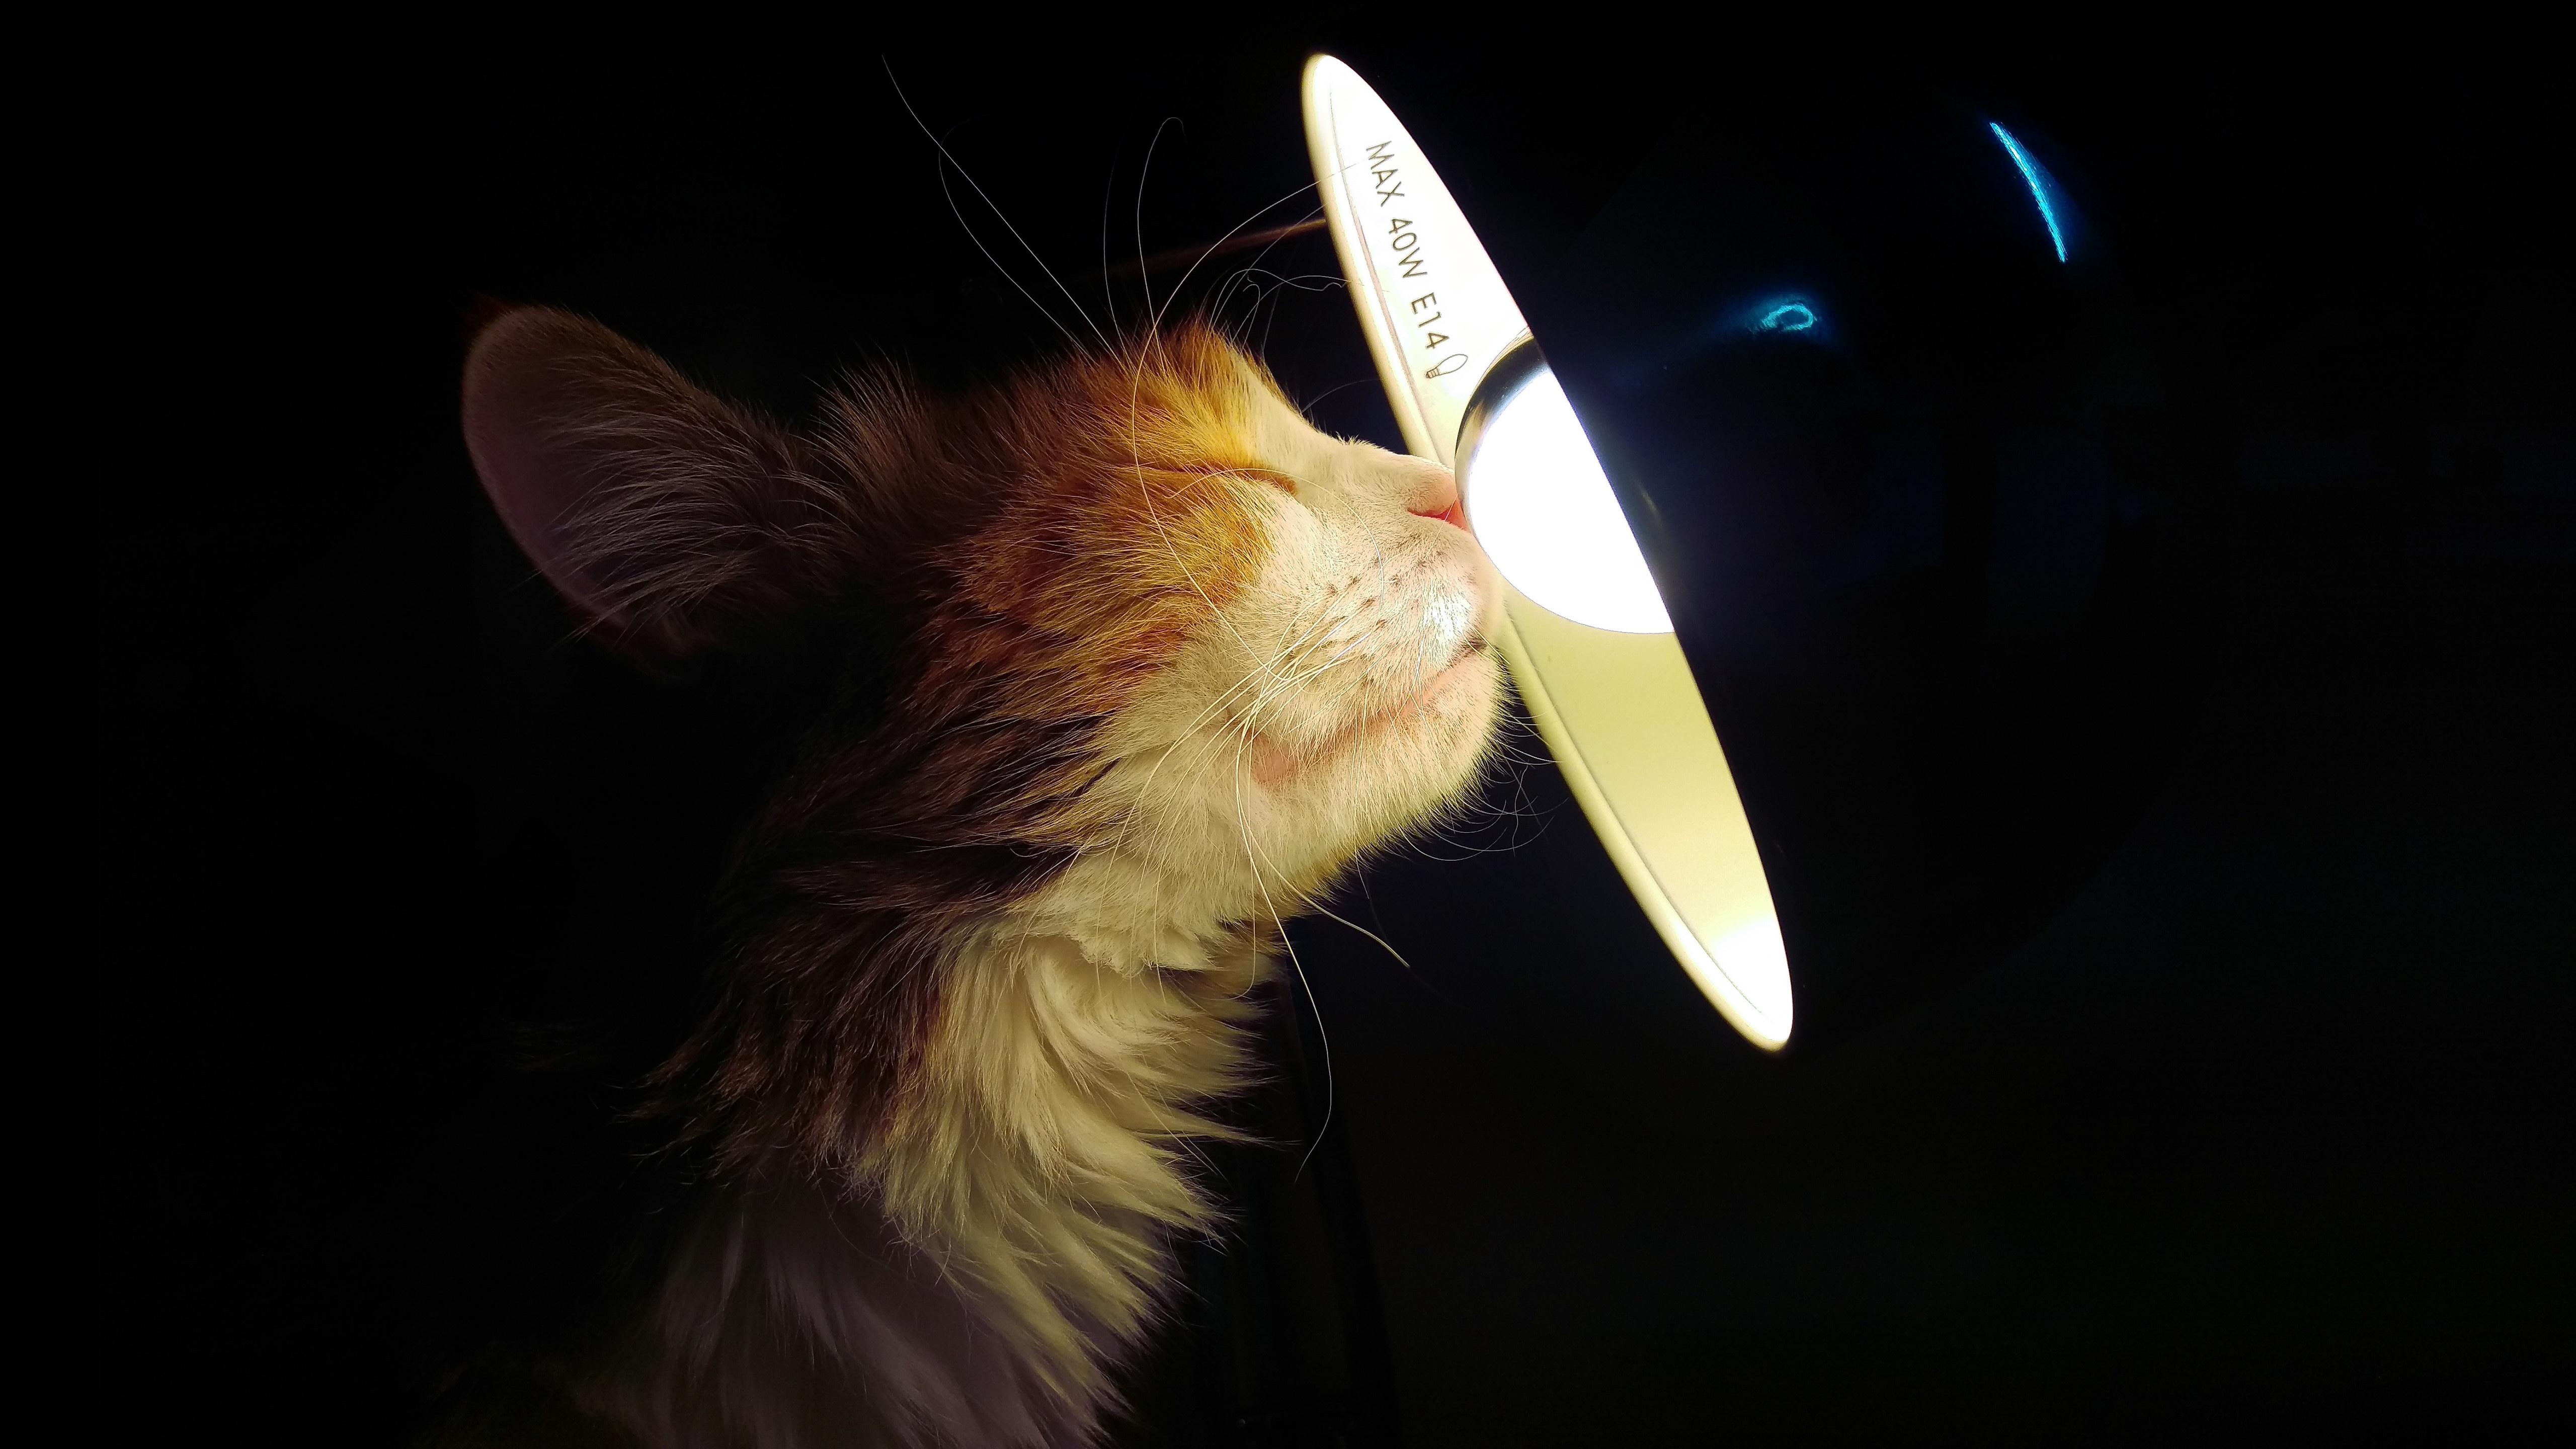 Фото кот лампа накаливания Лампа Морда Животные коты кошка Кошки Лампочка ламп лампы морды животное